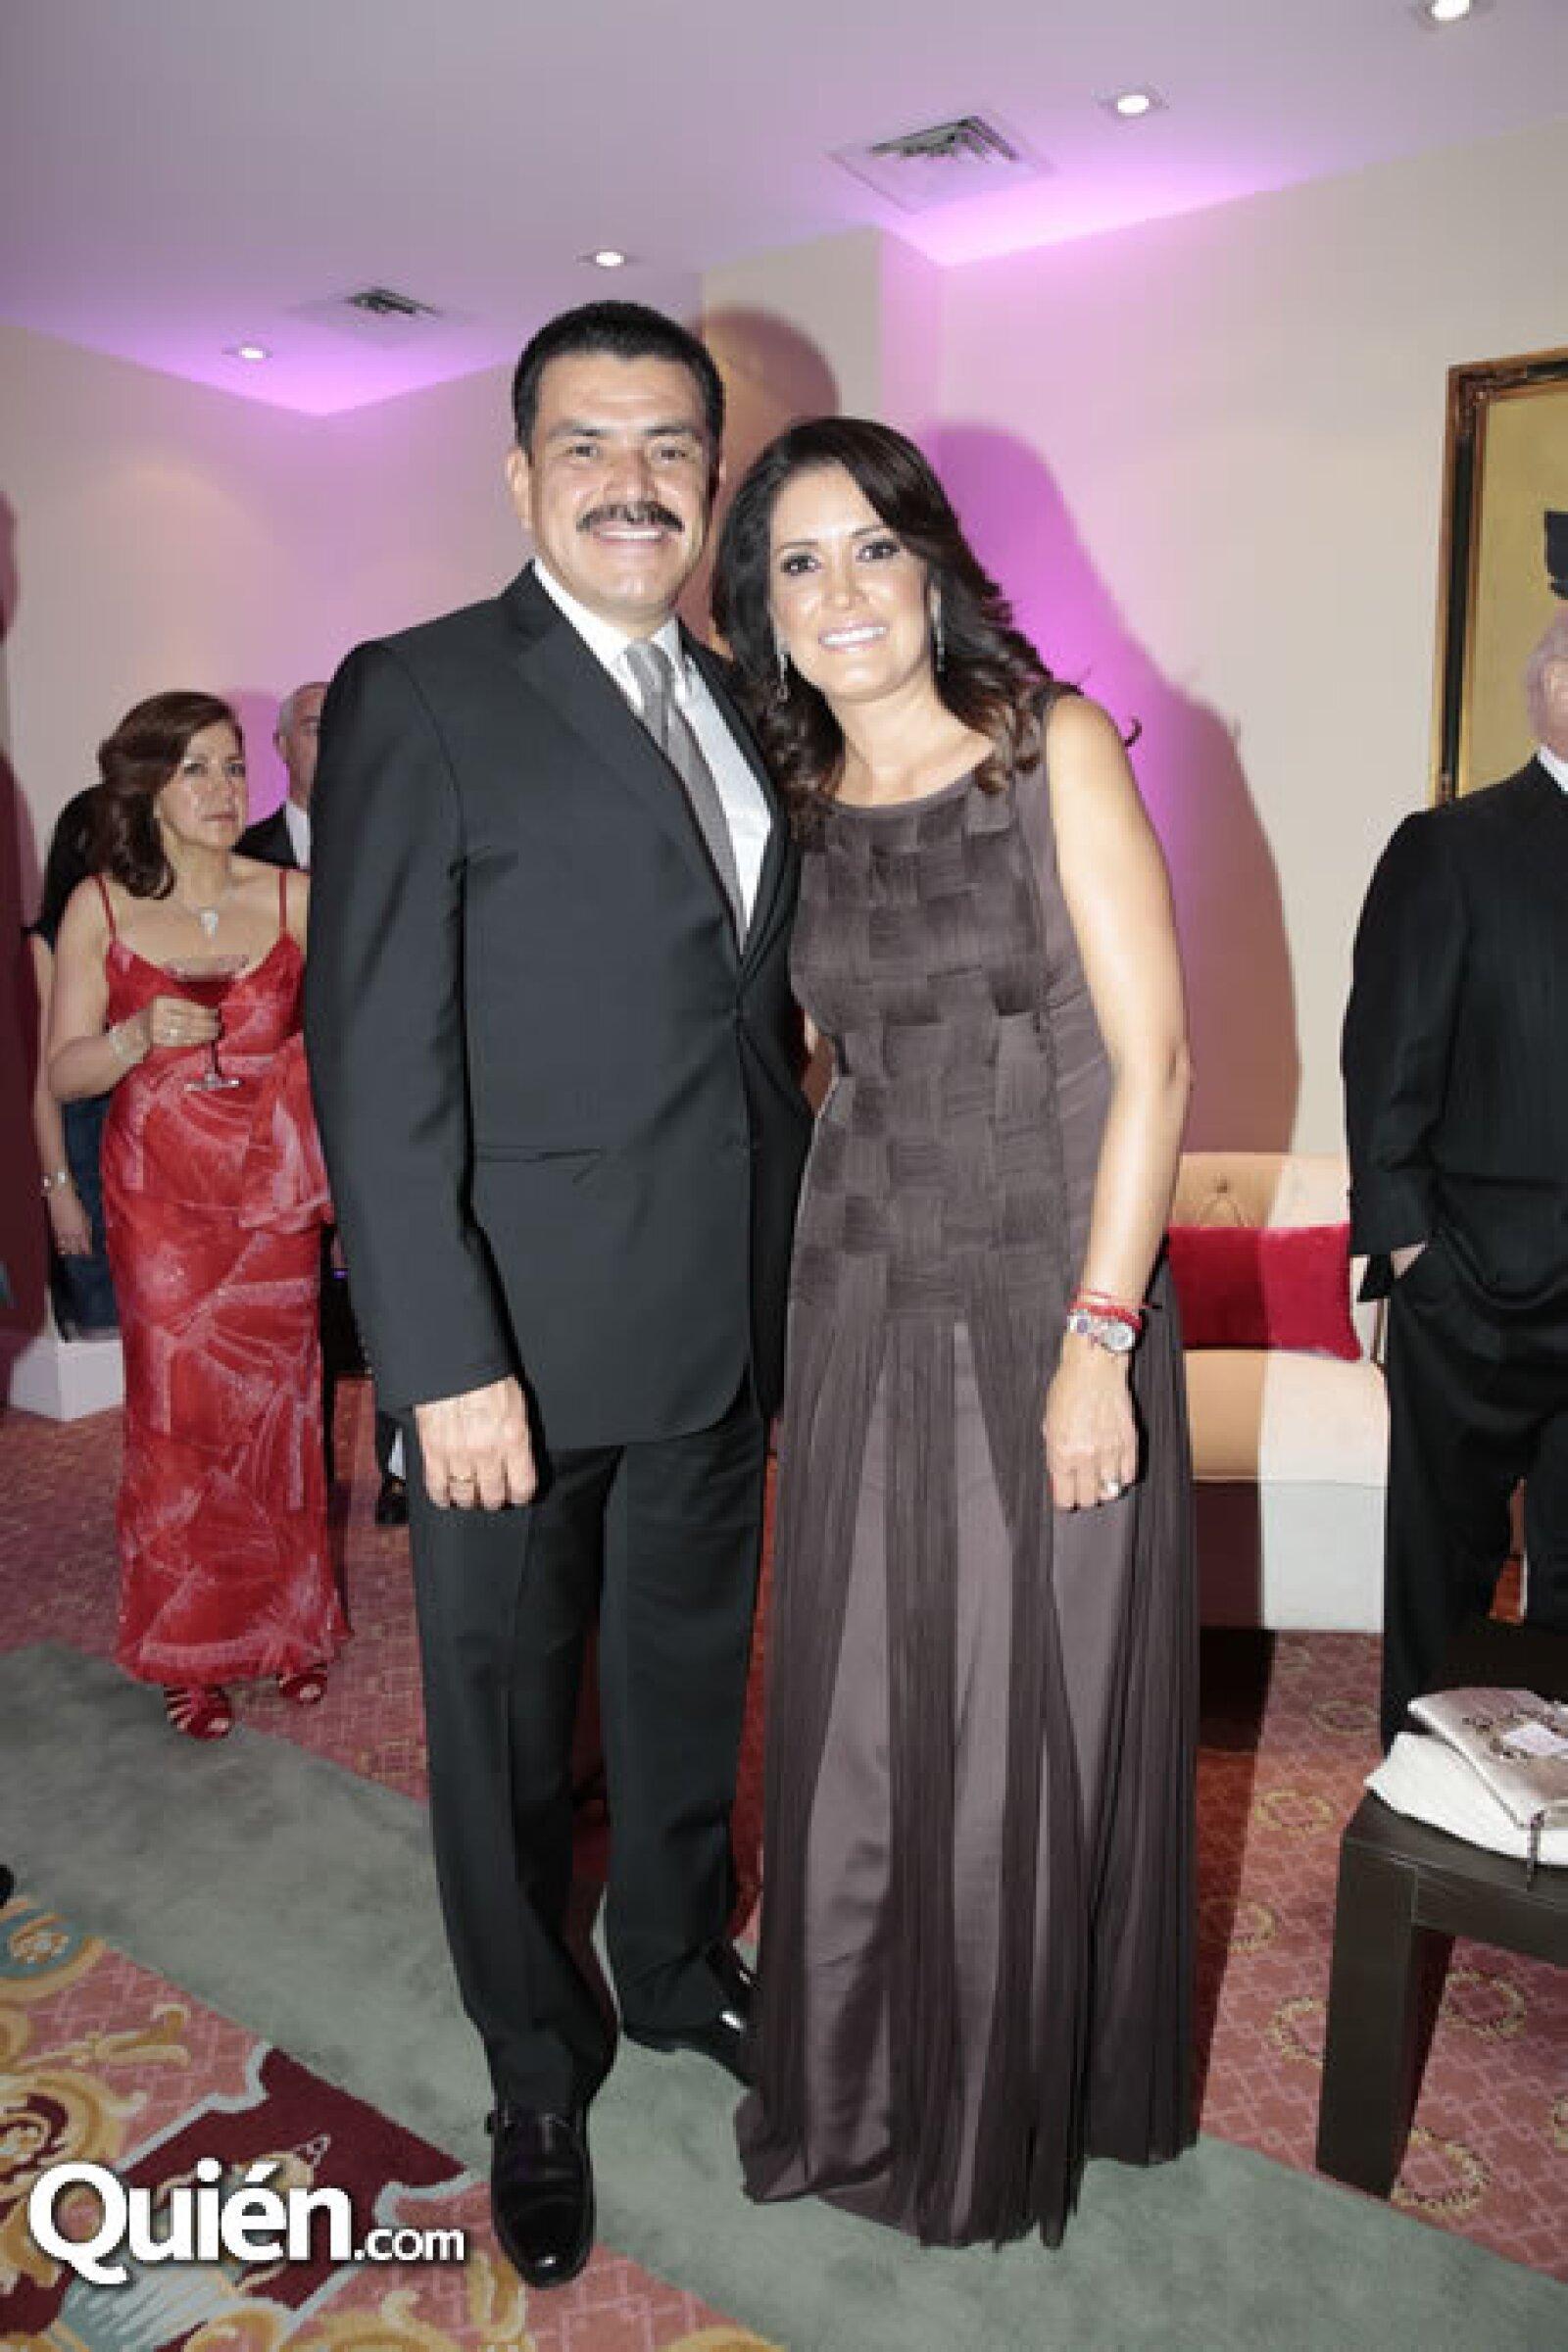 Francisco Olvera (Gobernador de Hidalgo),Guadalupe Romero